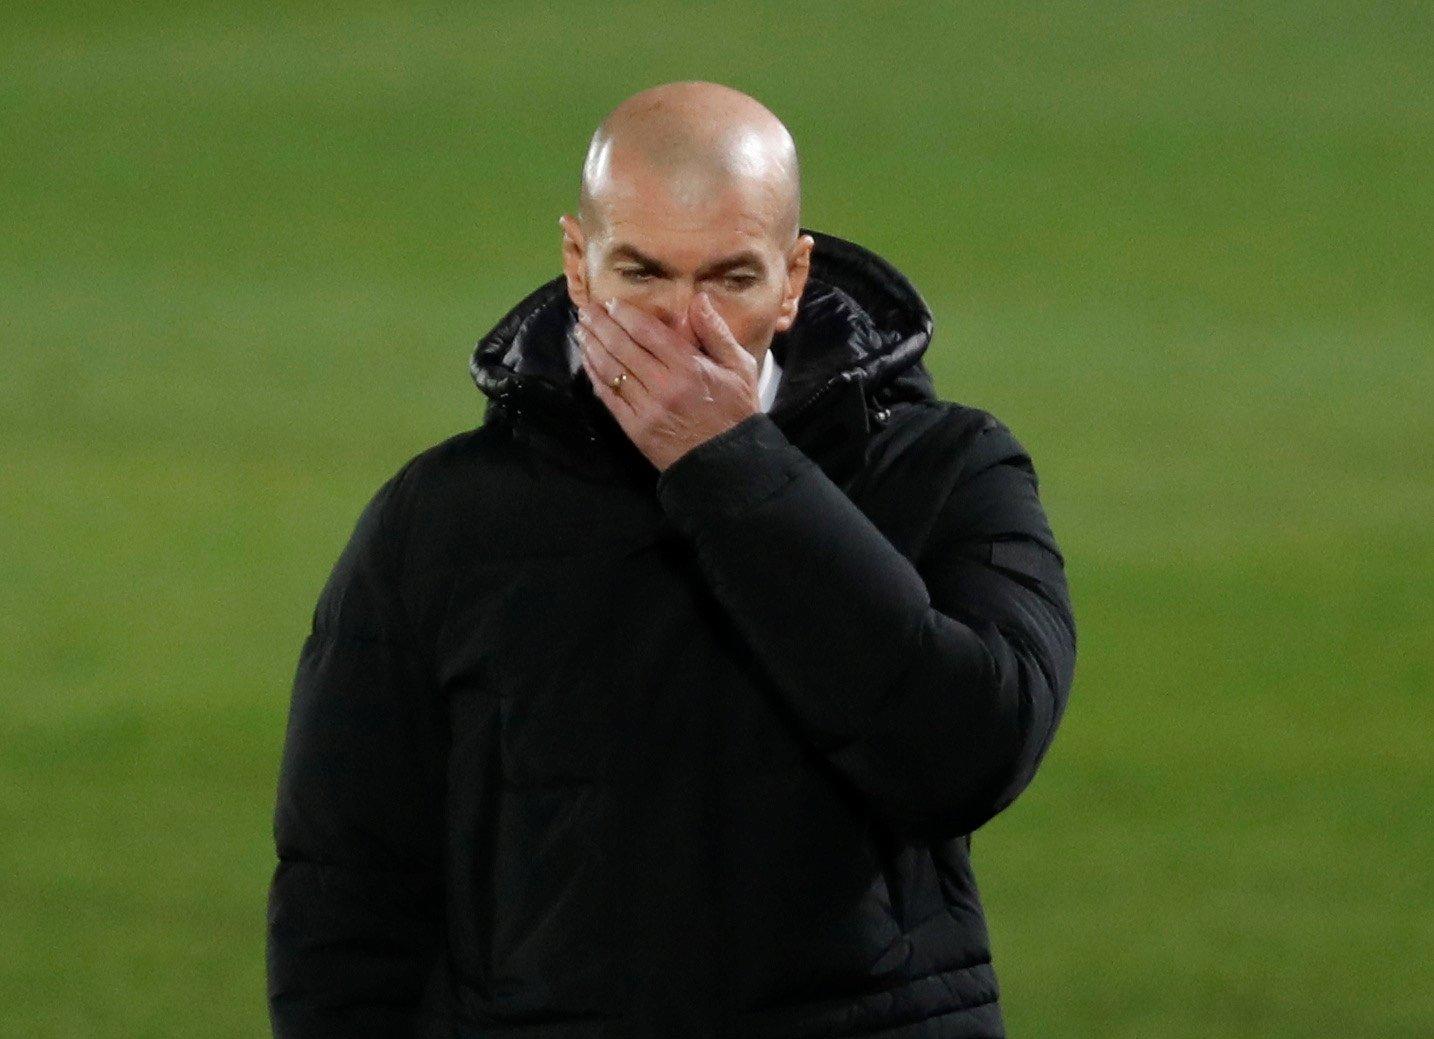 Real Madrid coach Zinedine Zidane reacts during a La Liga match against Granada, Estadio Alfredo Di Stefano, Madrid, Spain, Dec. 23, 2020. (Reuters Photo)